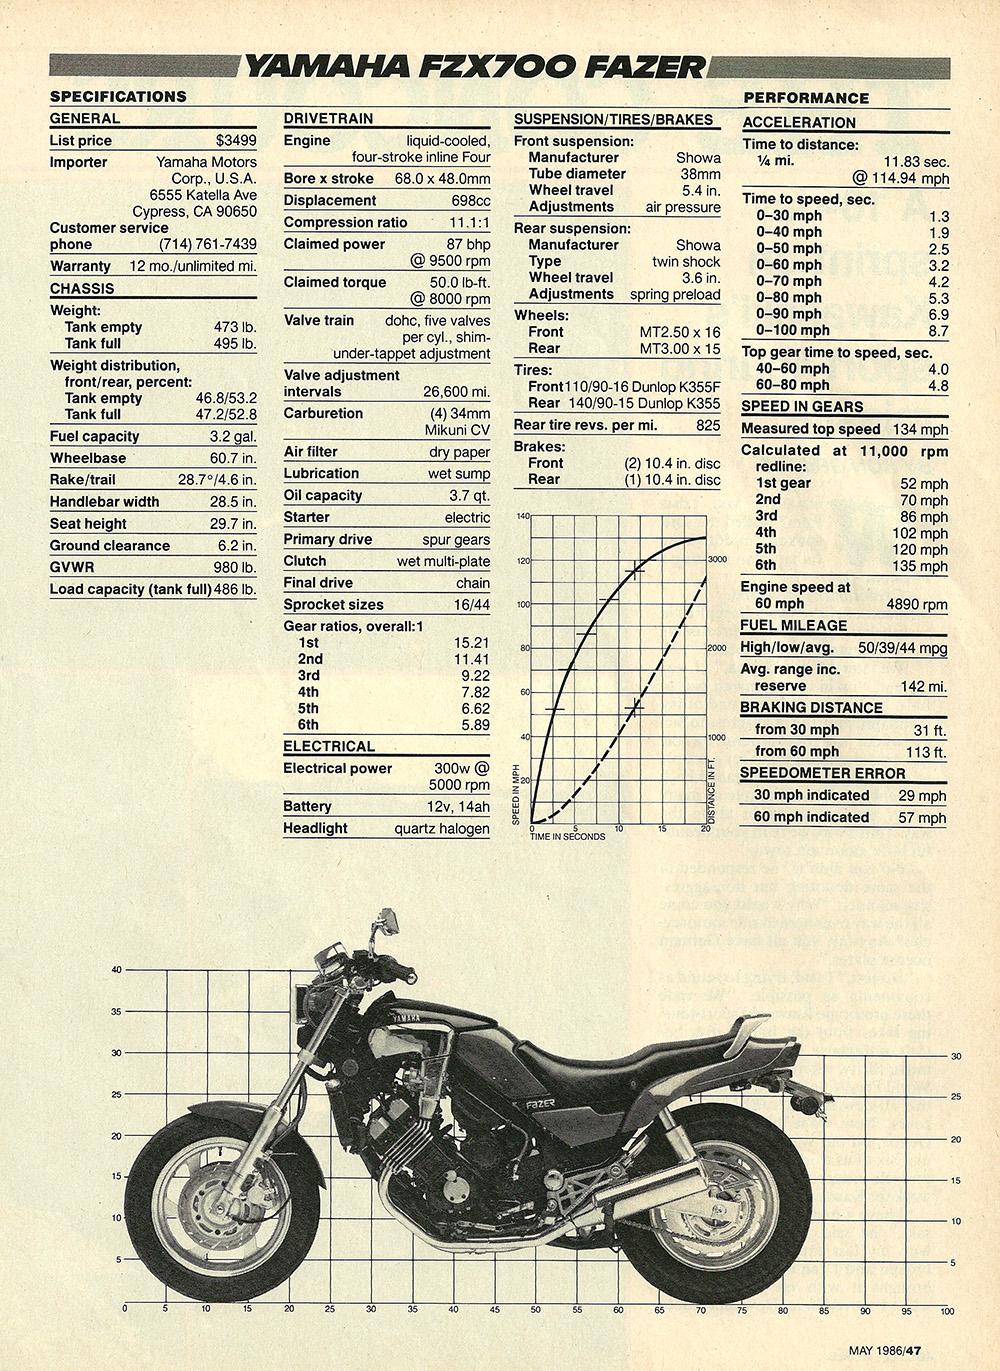 1986 Yamaha Fazer FZX700 road test 06.jpg